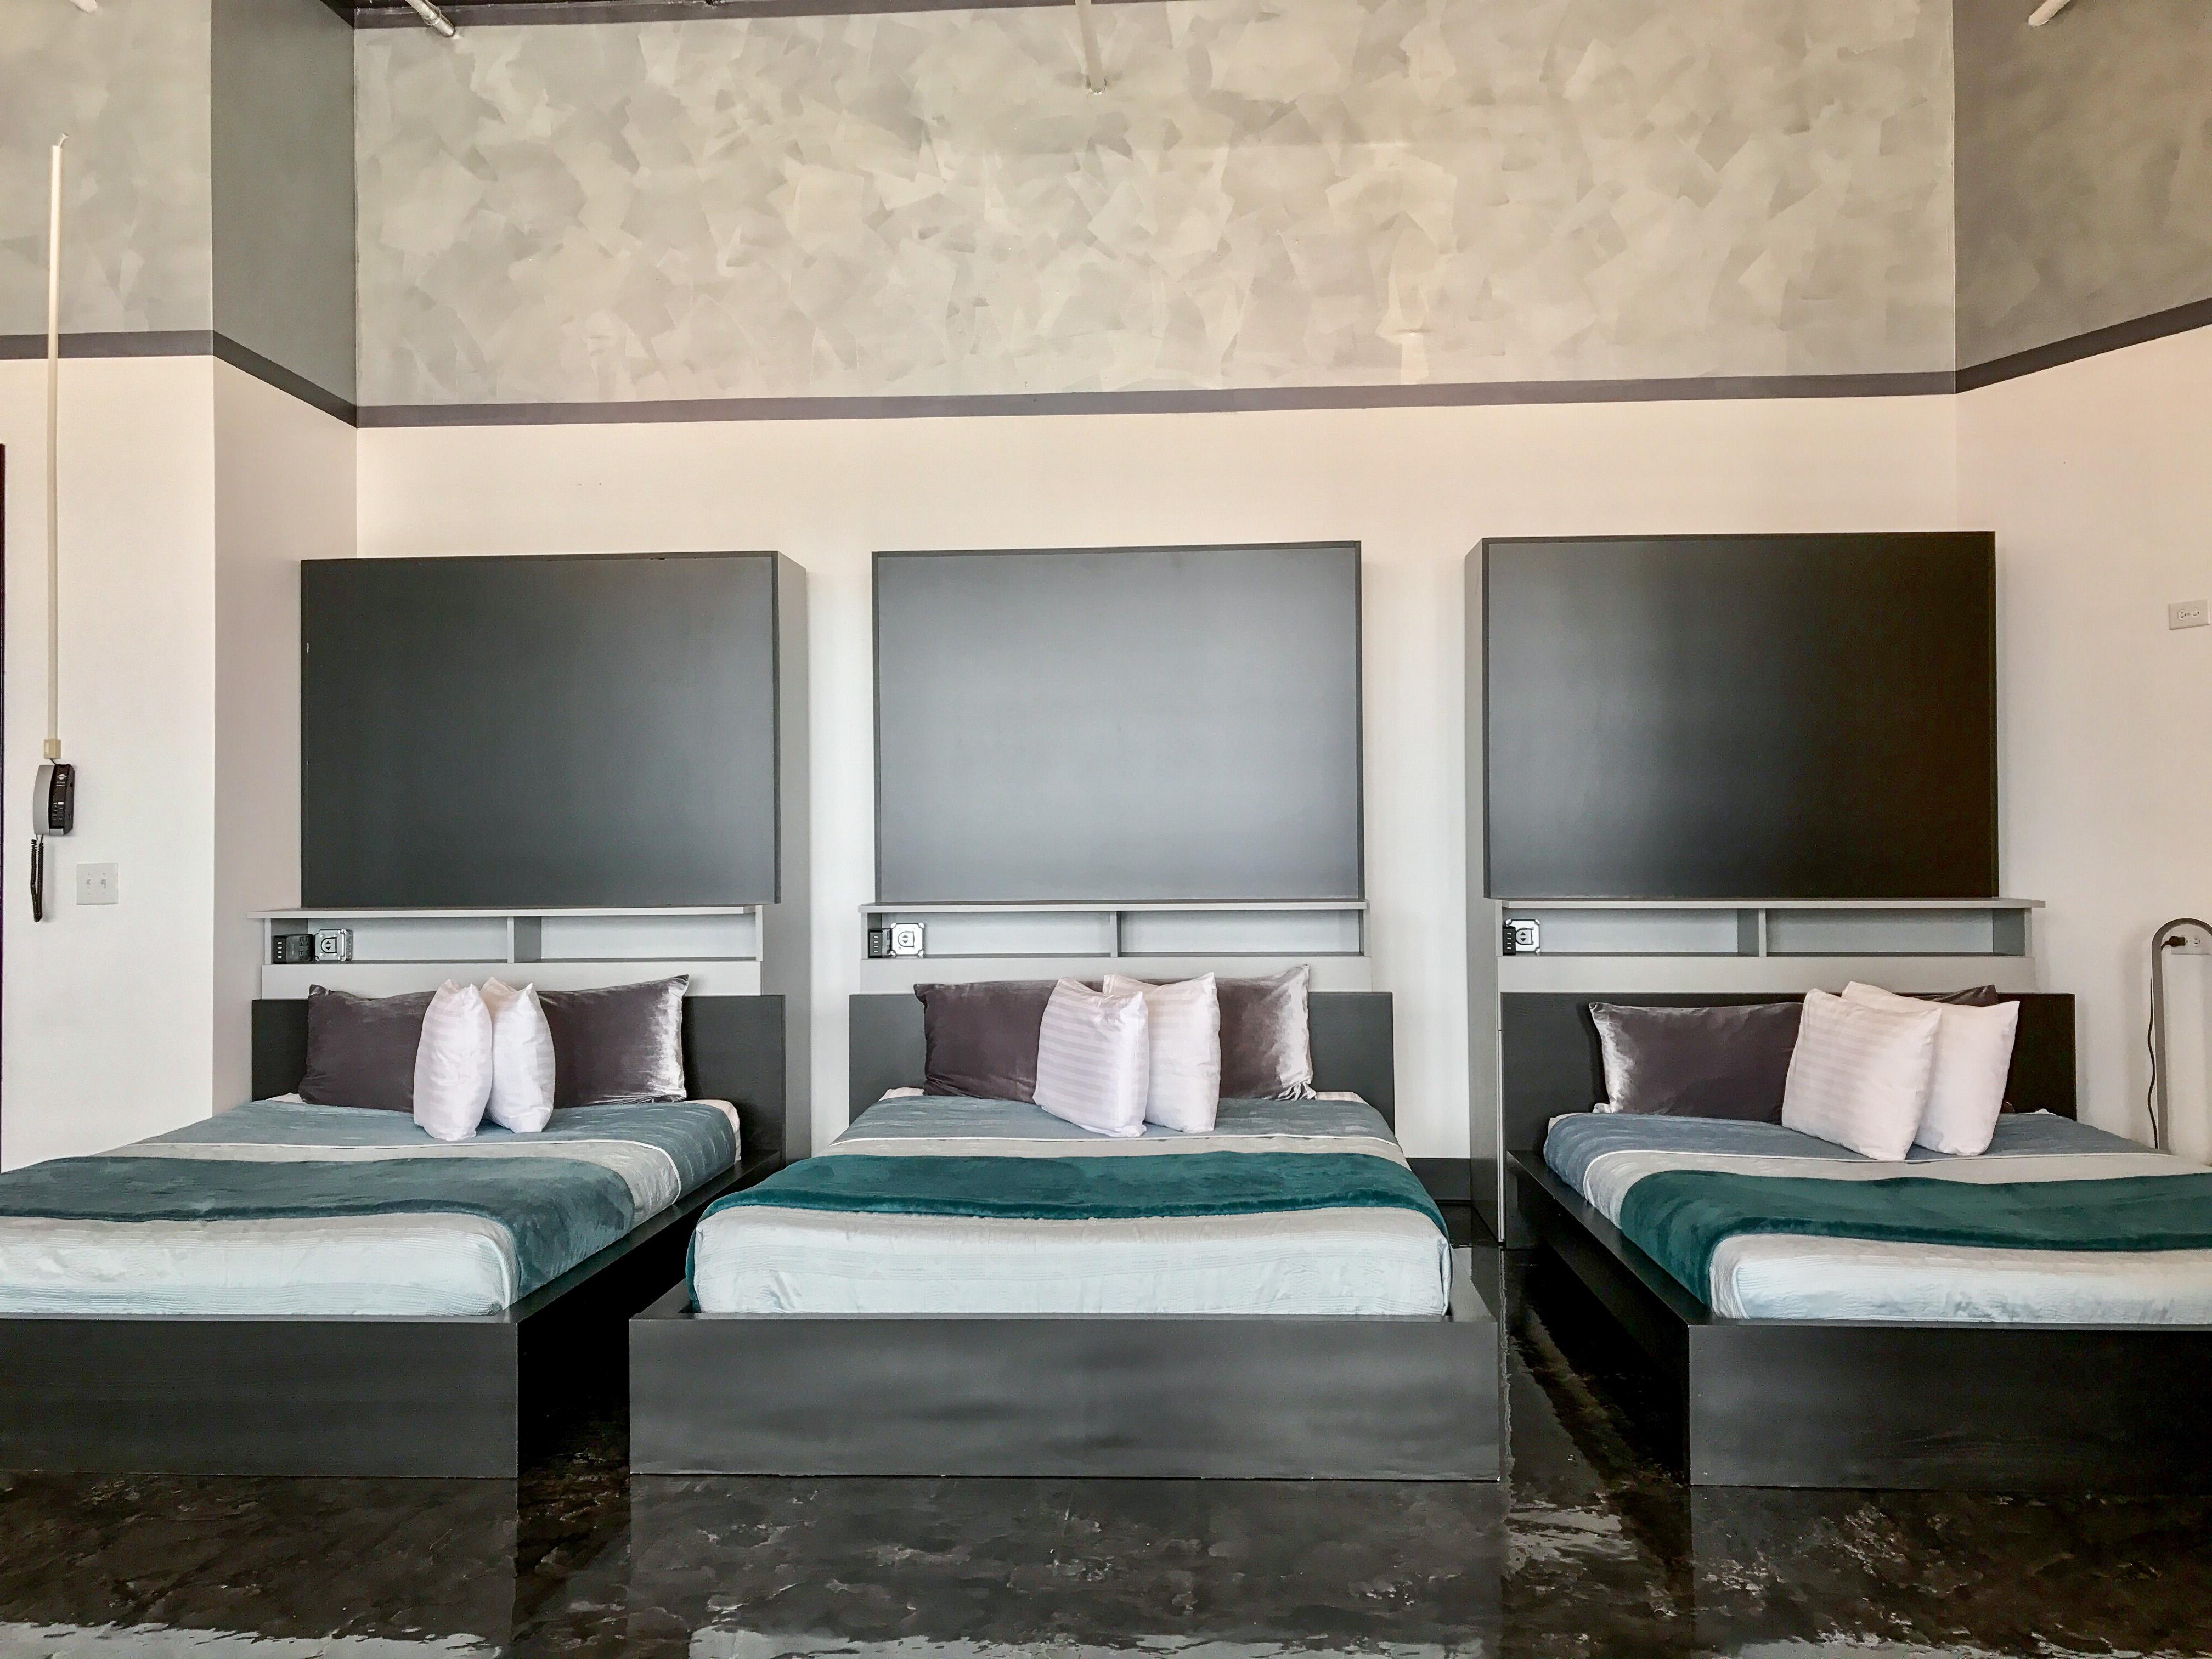 Loft Reverie Hotel 801 - Beds